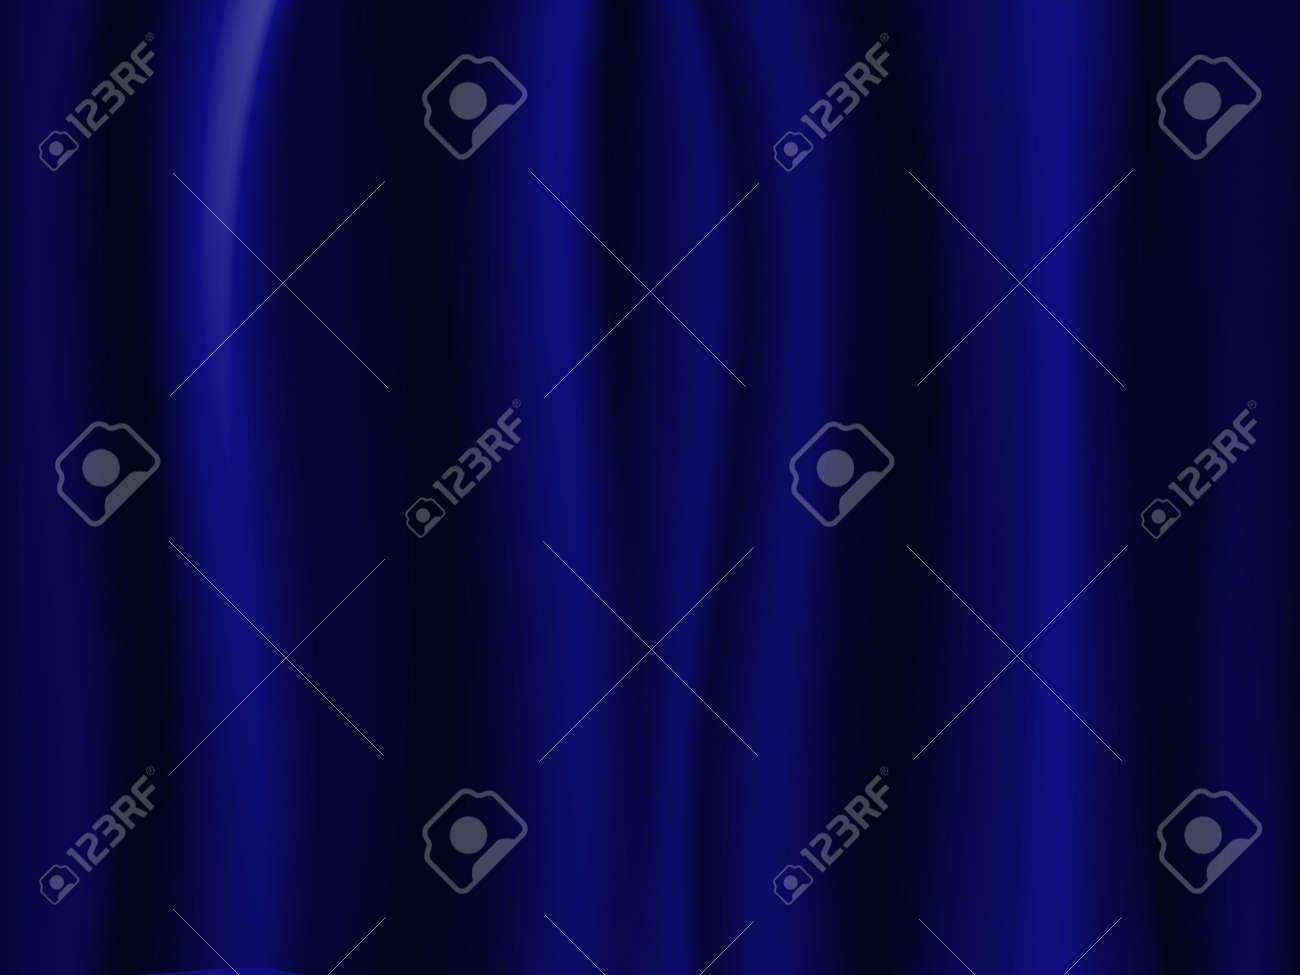 Wavy Dark Blue Curtain Beautiful Like A Wallpaper Stock Photo